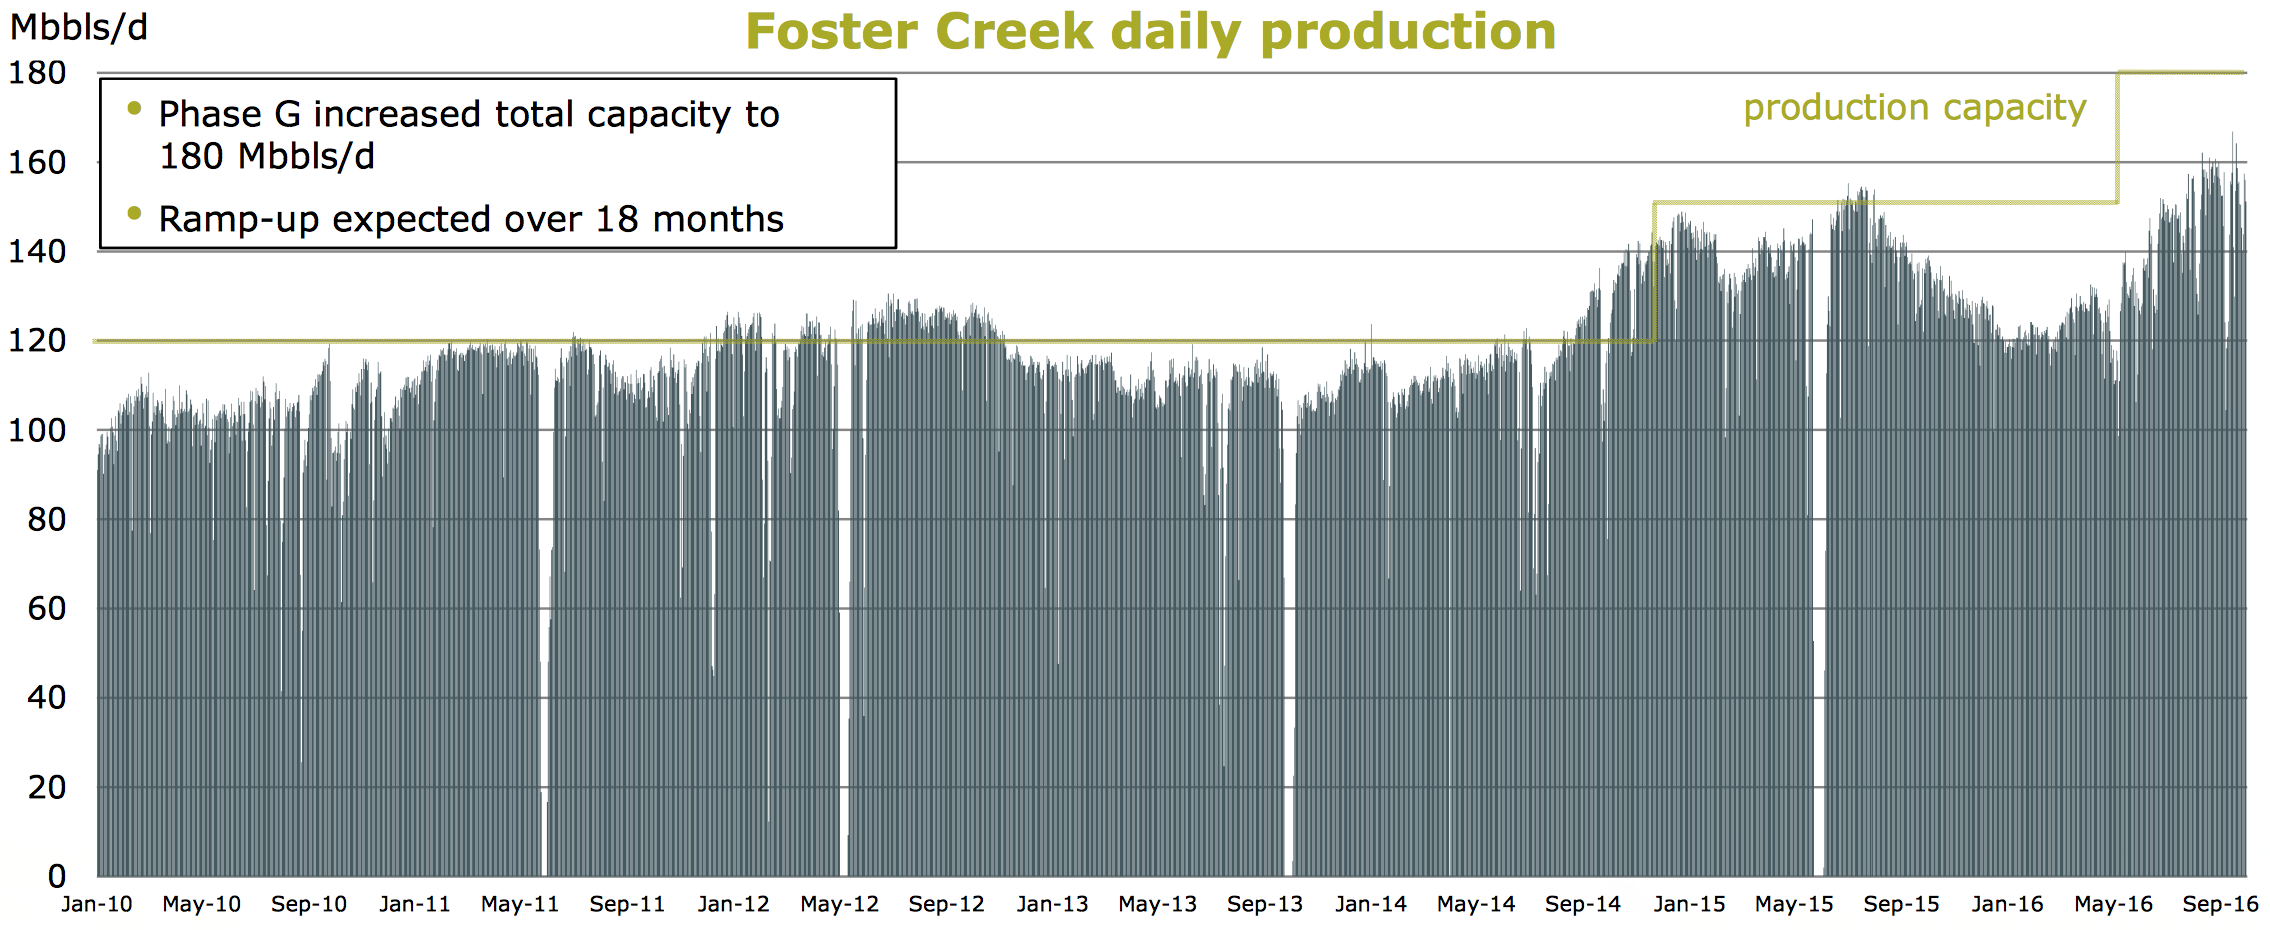 FOSTER CREEK PRODUCTION PROFILE (COURTESY CENOVUS ENERGY)